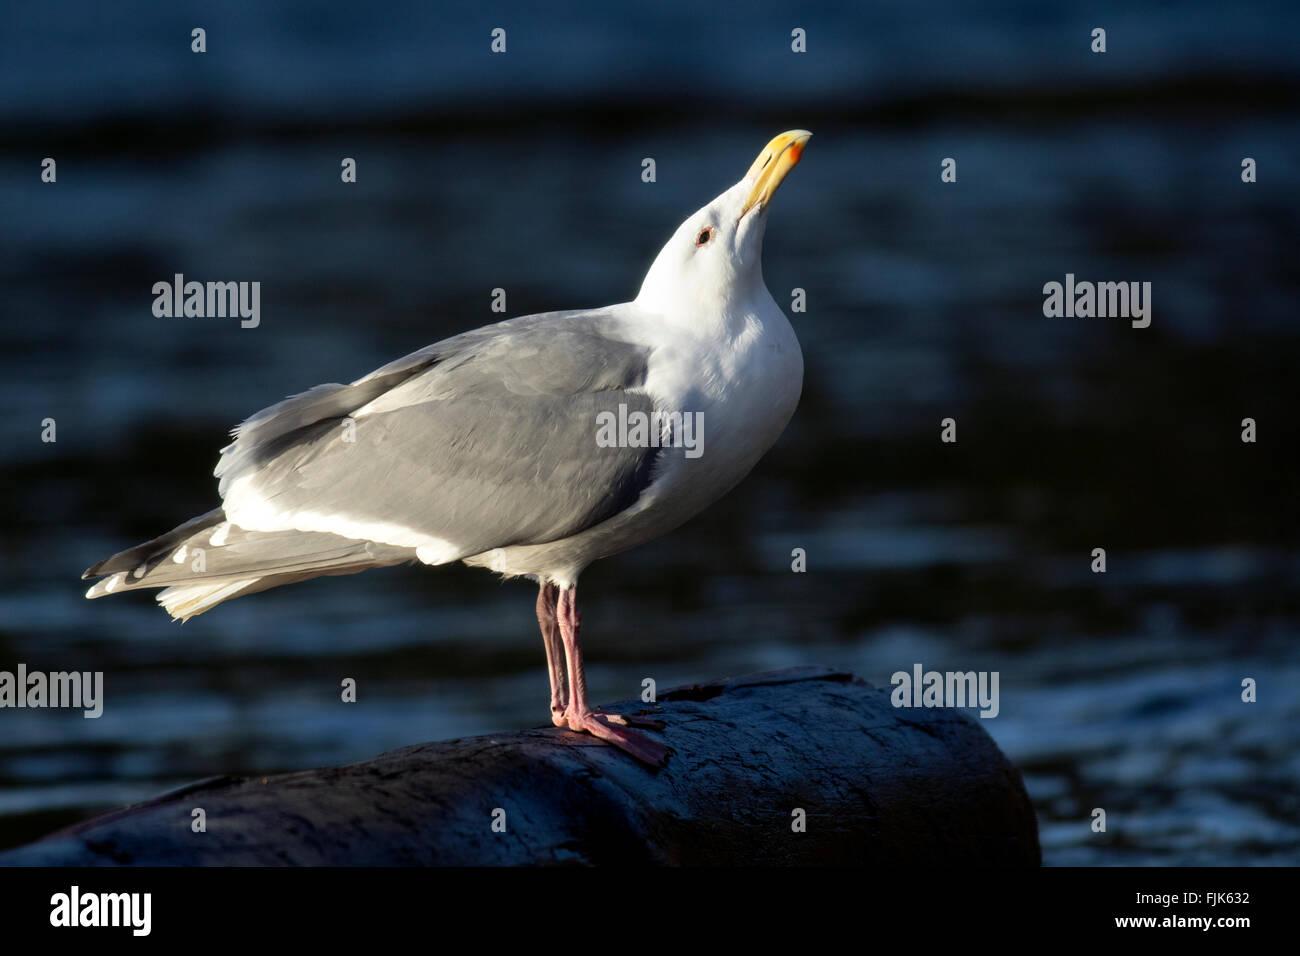 Glaucous-winged Gull (Larus glaucescens) - Victoria, Vancouver Island, British Columbia, Canada - Stock Image